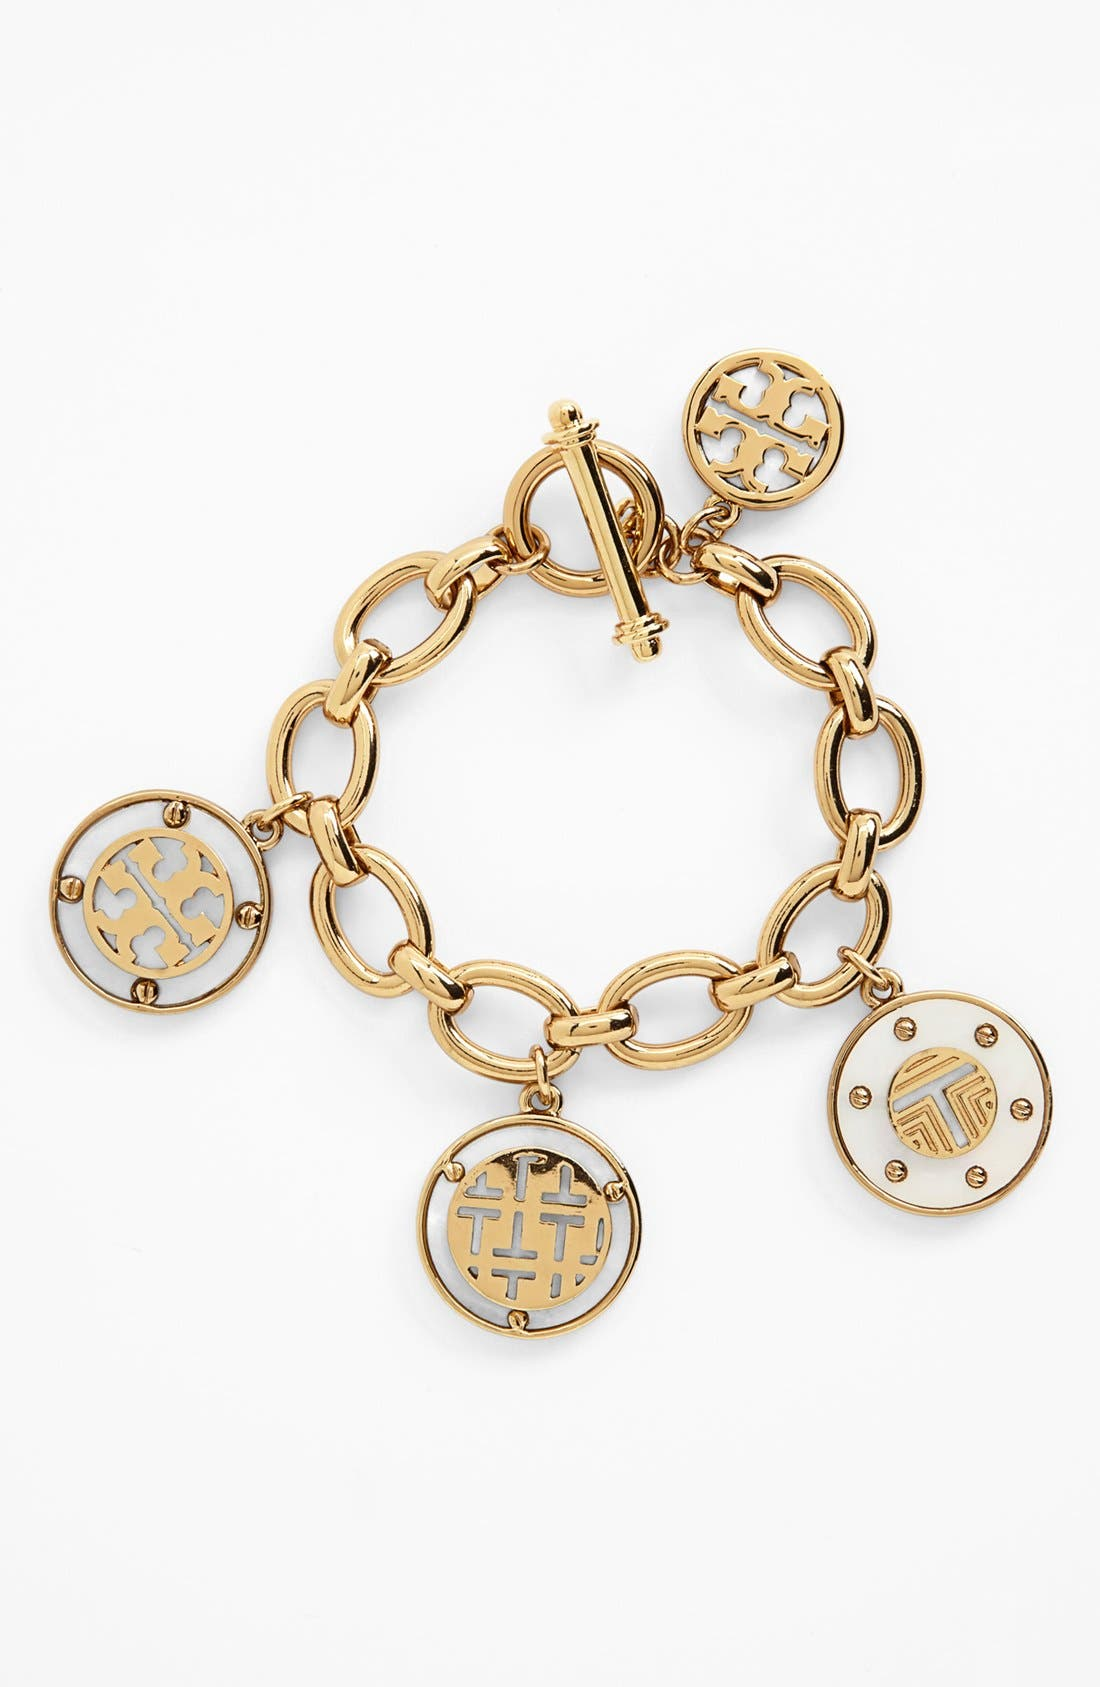 Main Image - Tory Burch 'Wren Logo T' Charm Bracelet